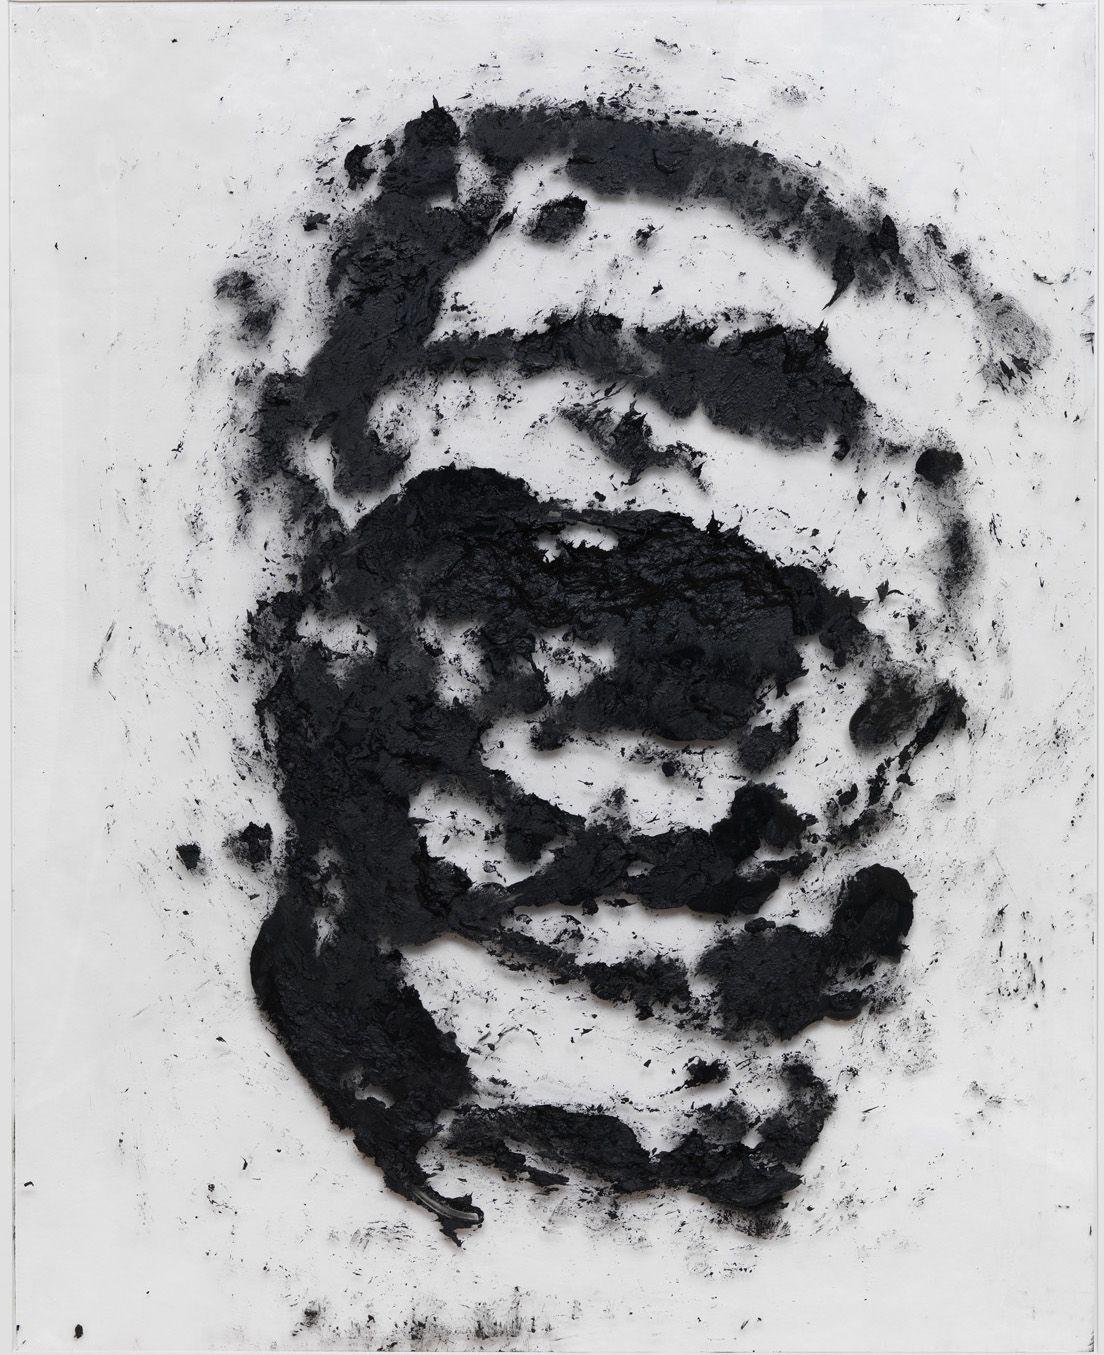 Richard Serra,Transparency #15, 2012.